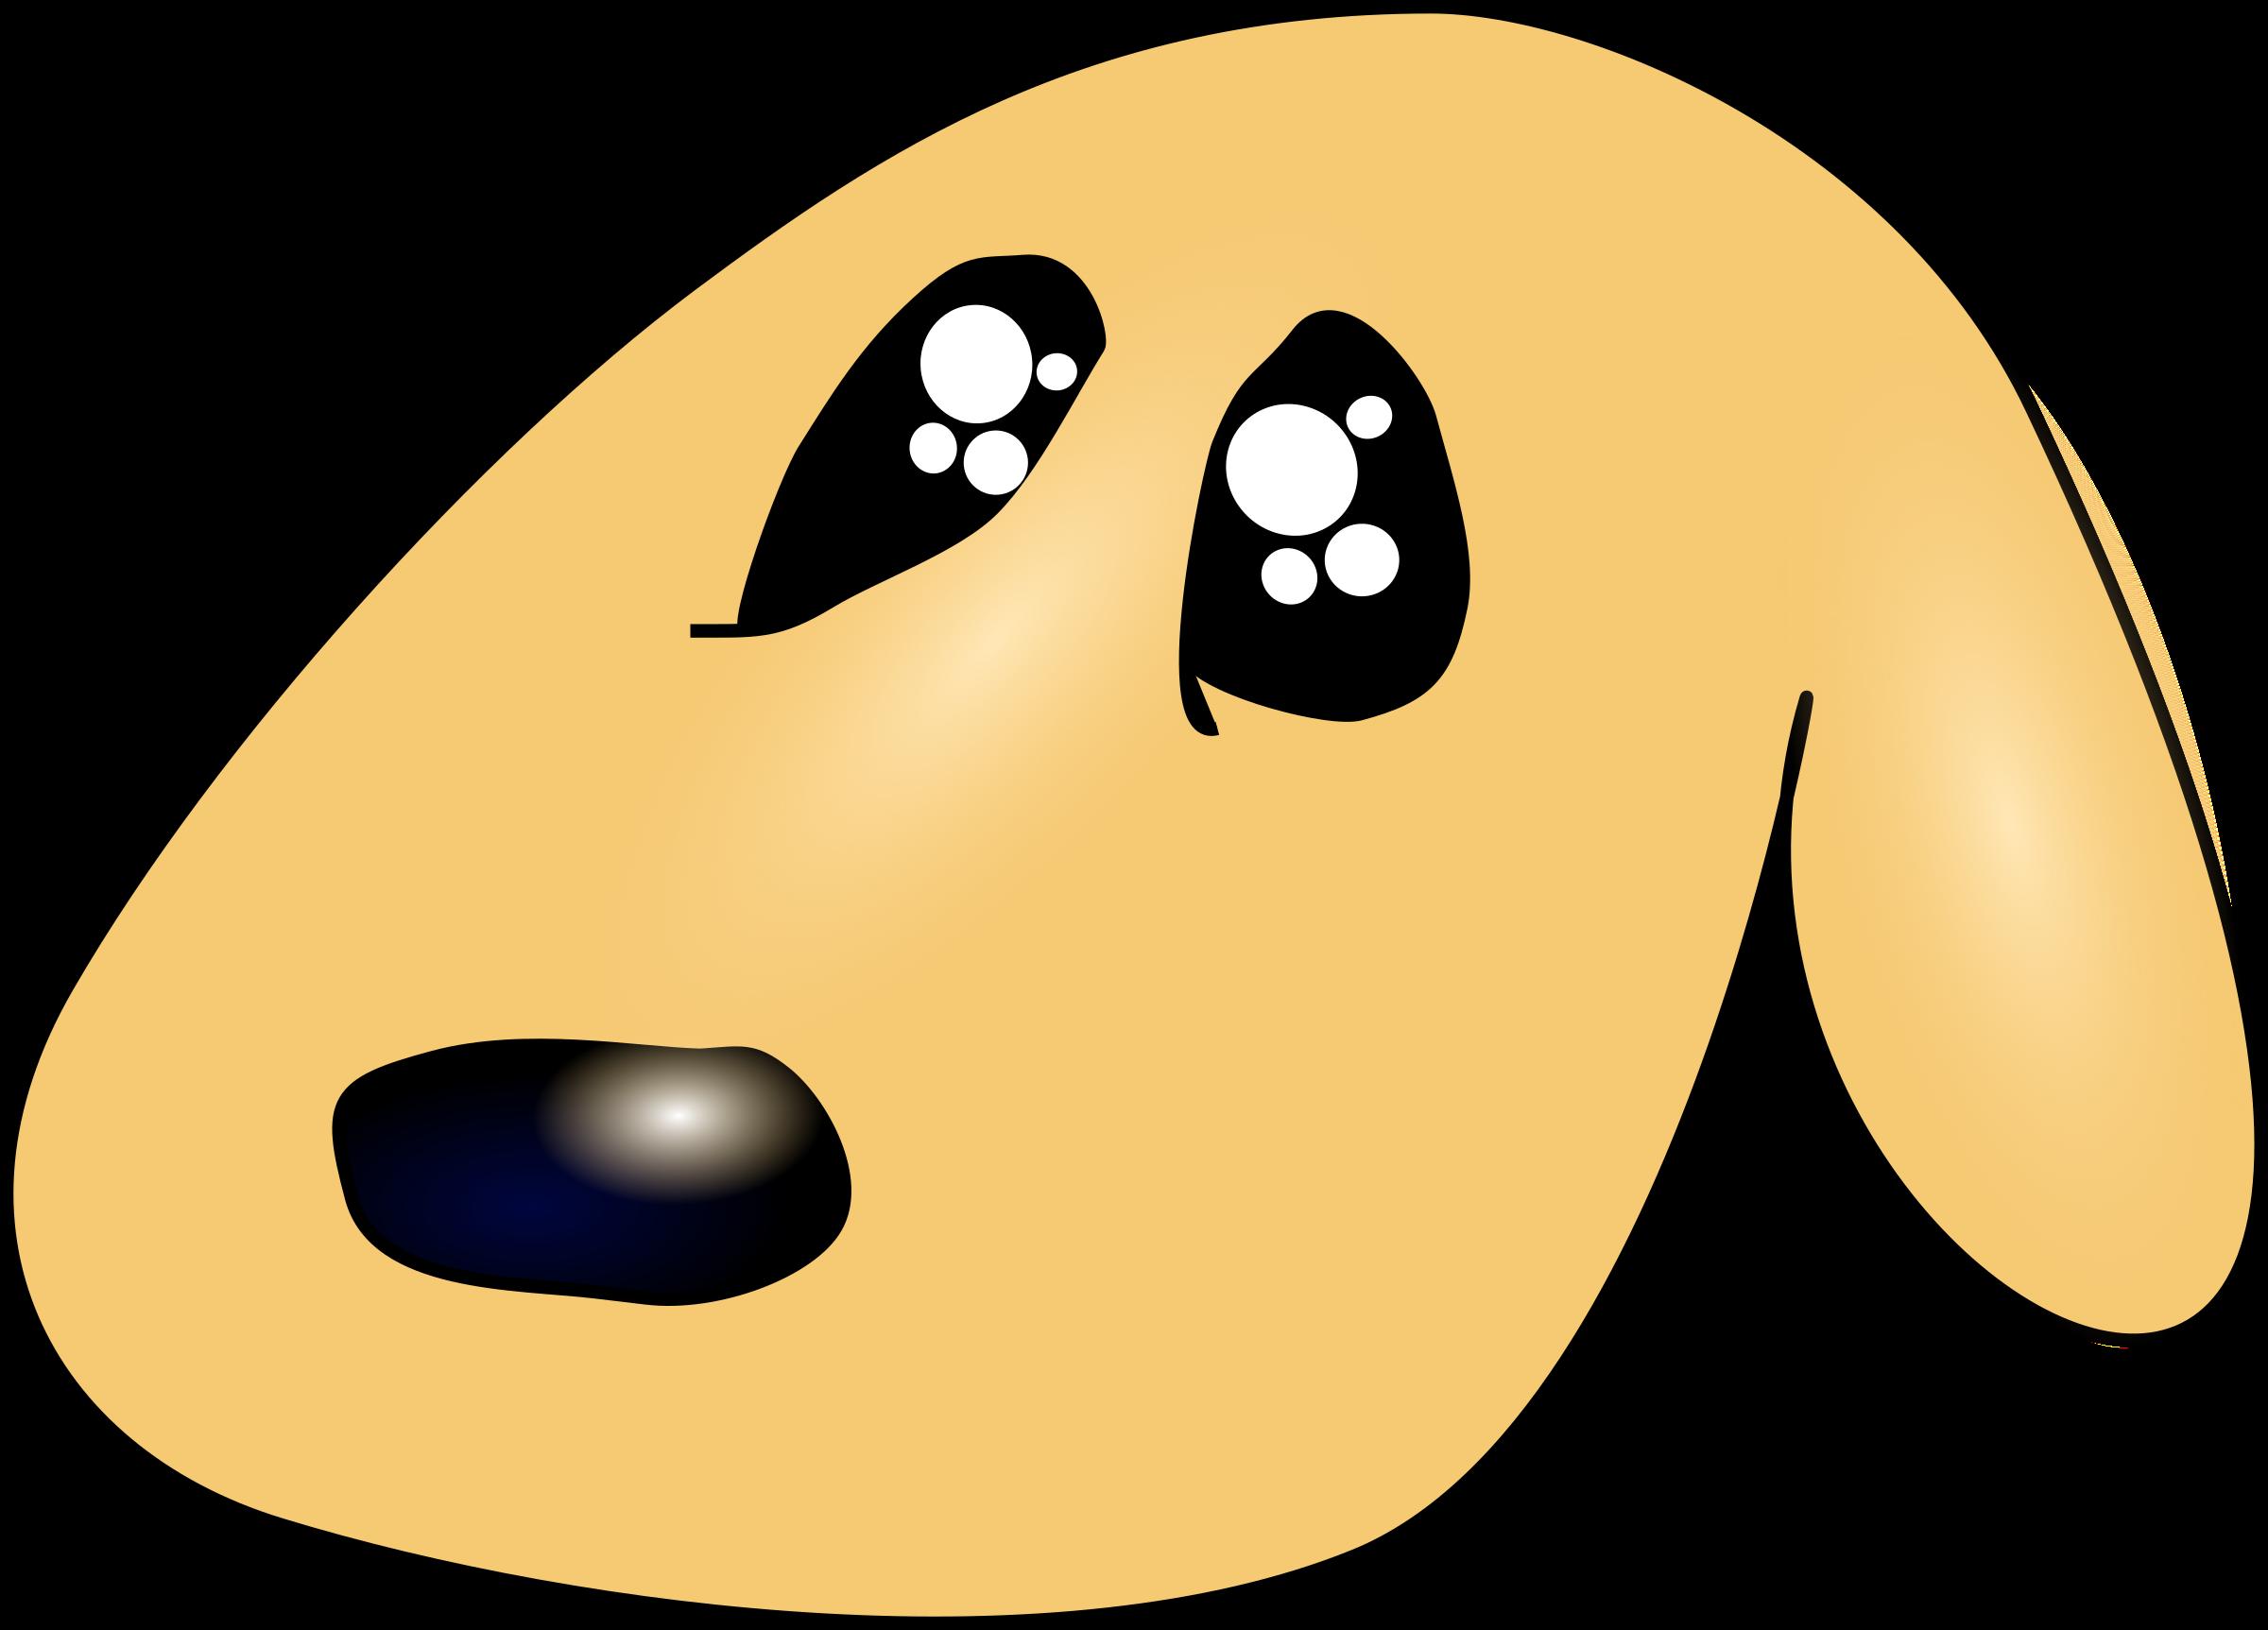 Cute sad big image. Clipart tree dog